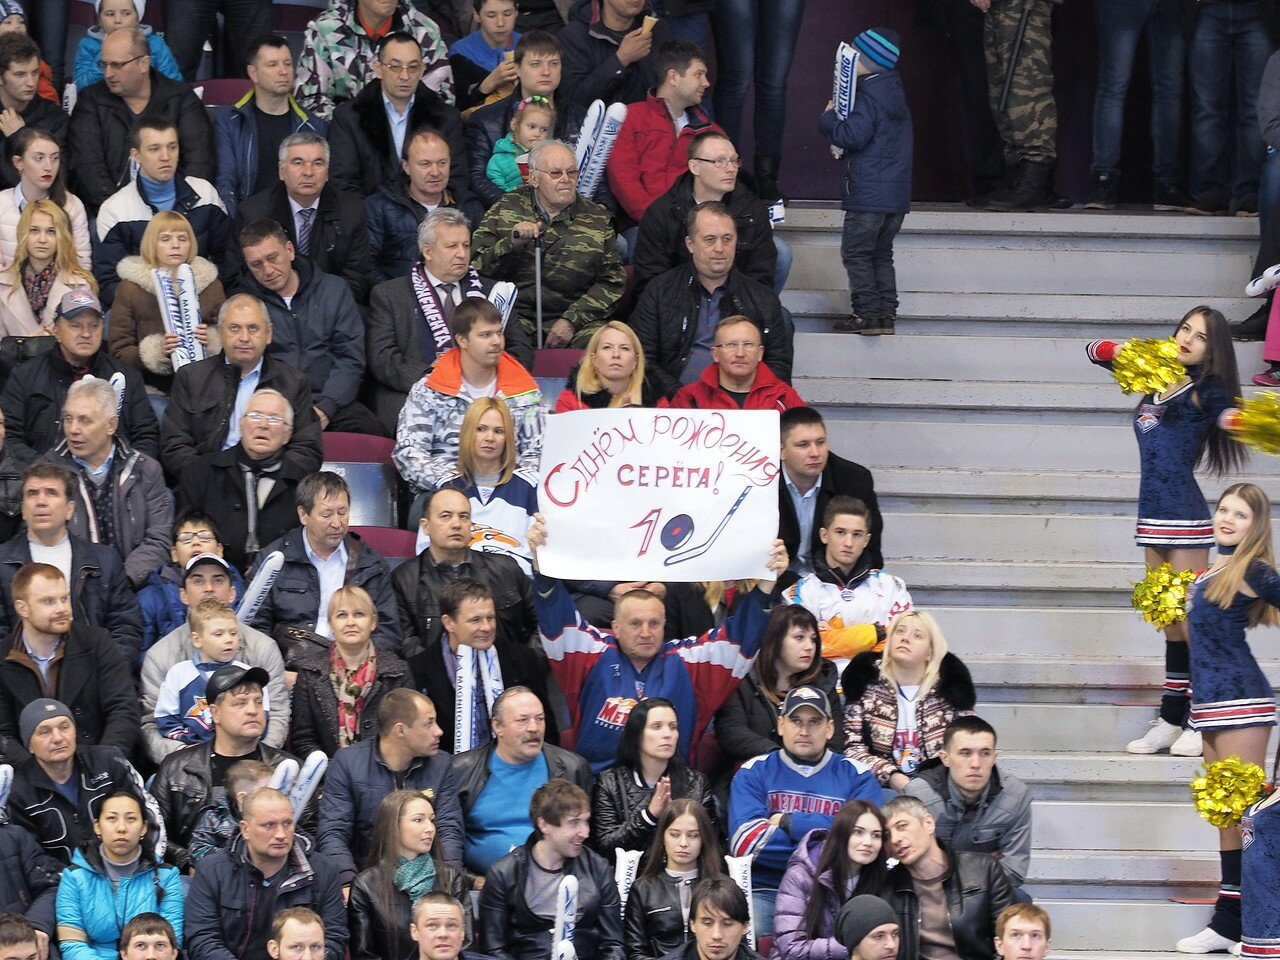 57Плей-офф 2016 Восток Финал Металлург - Салават Юлаев 31.03.2016